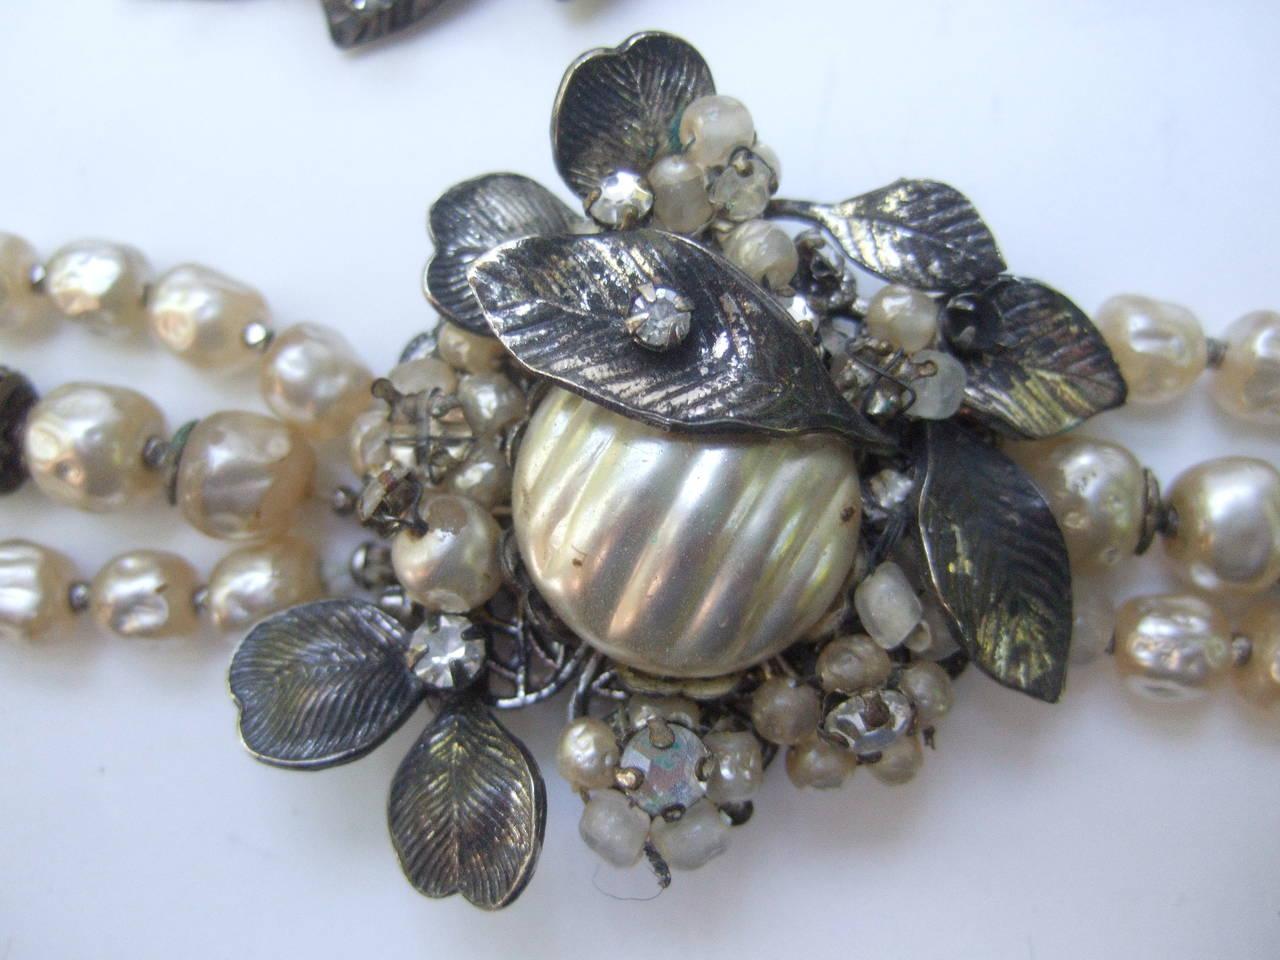 1950s Costume Pearl Brooch, Bracelet & Earrings by Robert For Sale 1